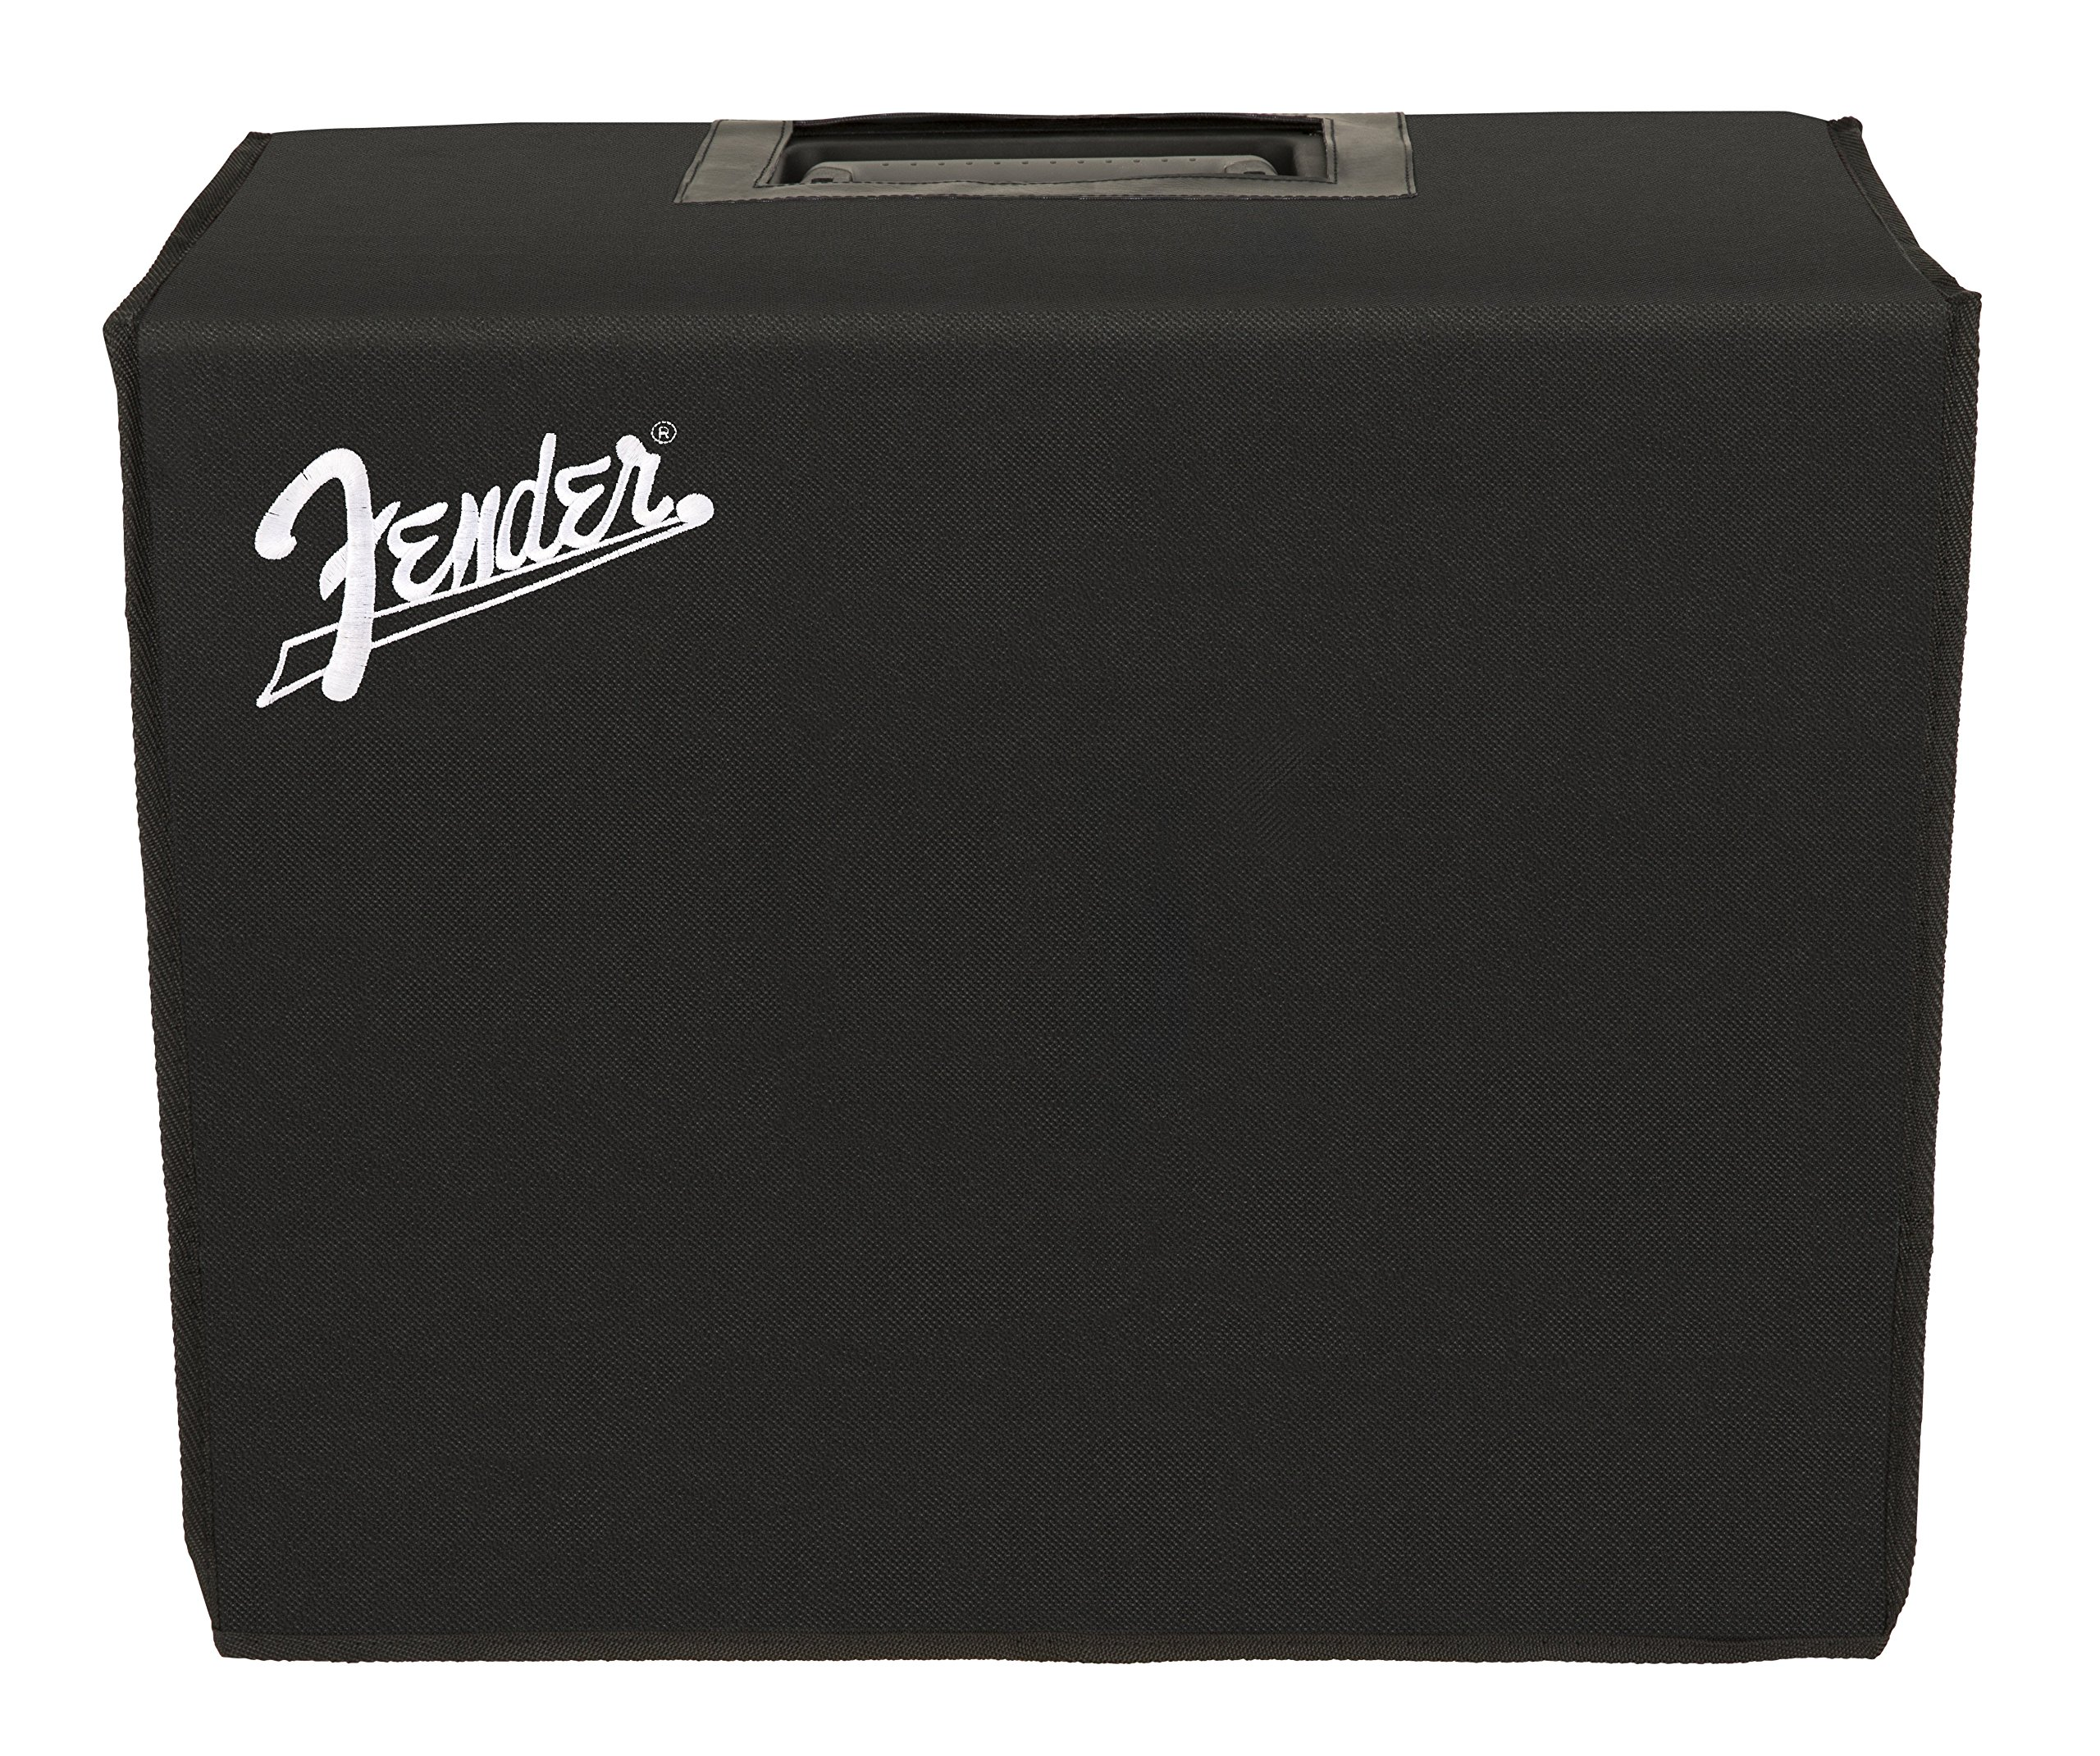 Fender Mustang GT 100 Amplifier Cover Black by Fender